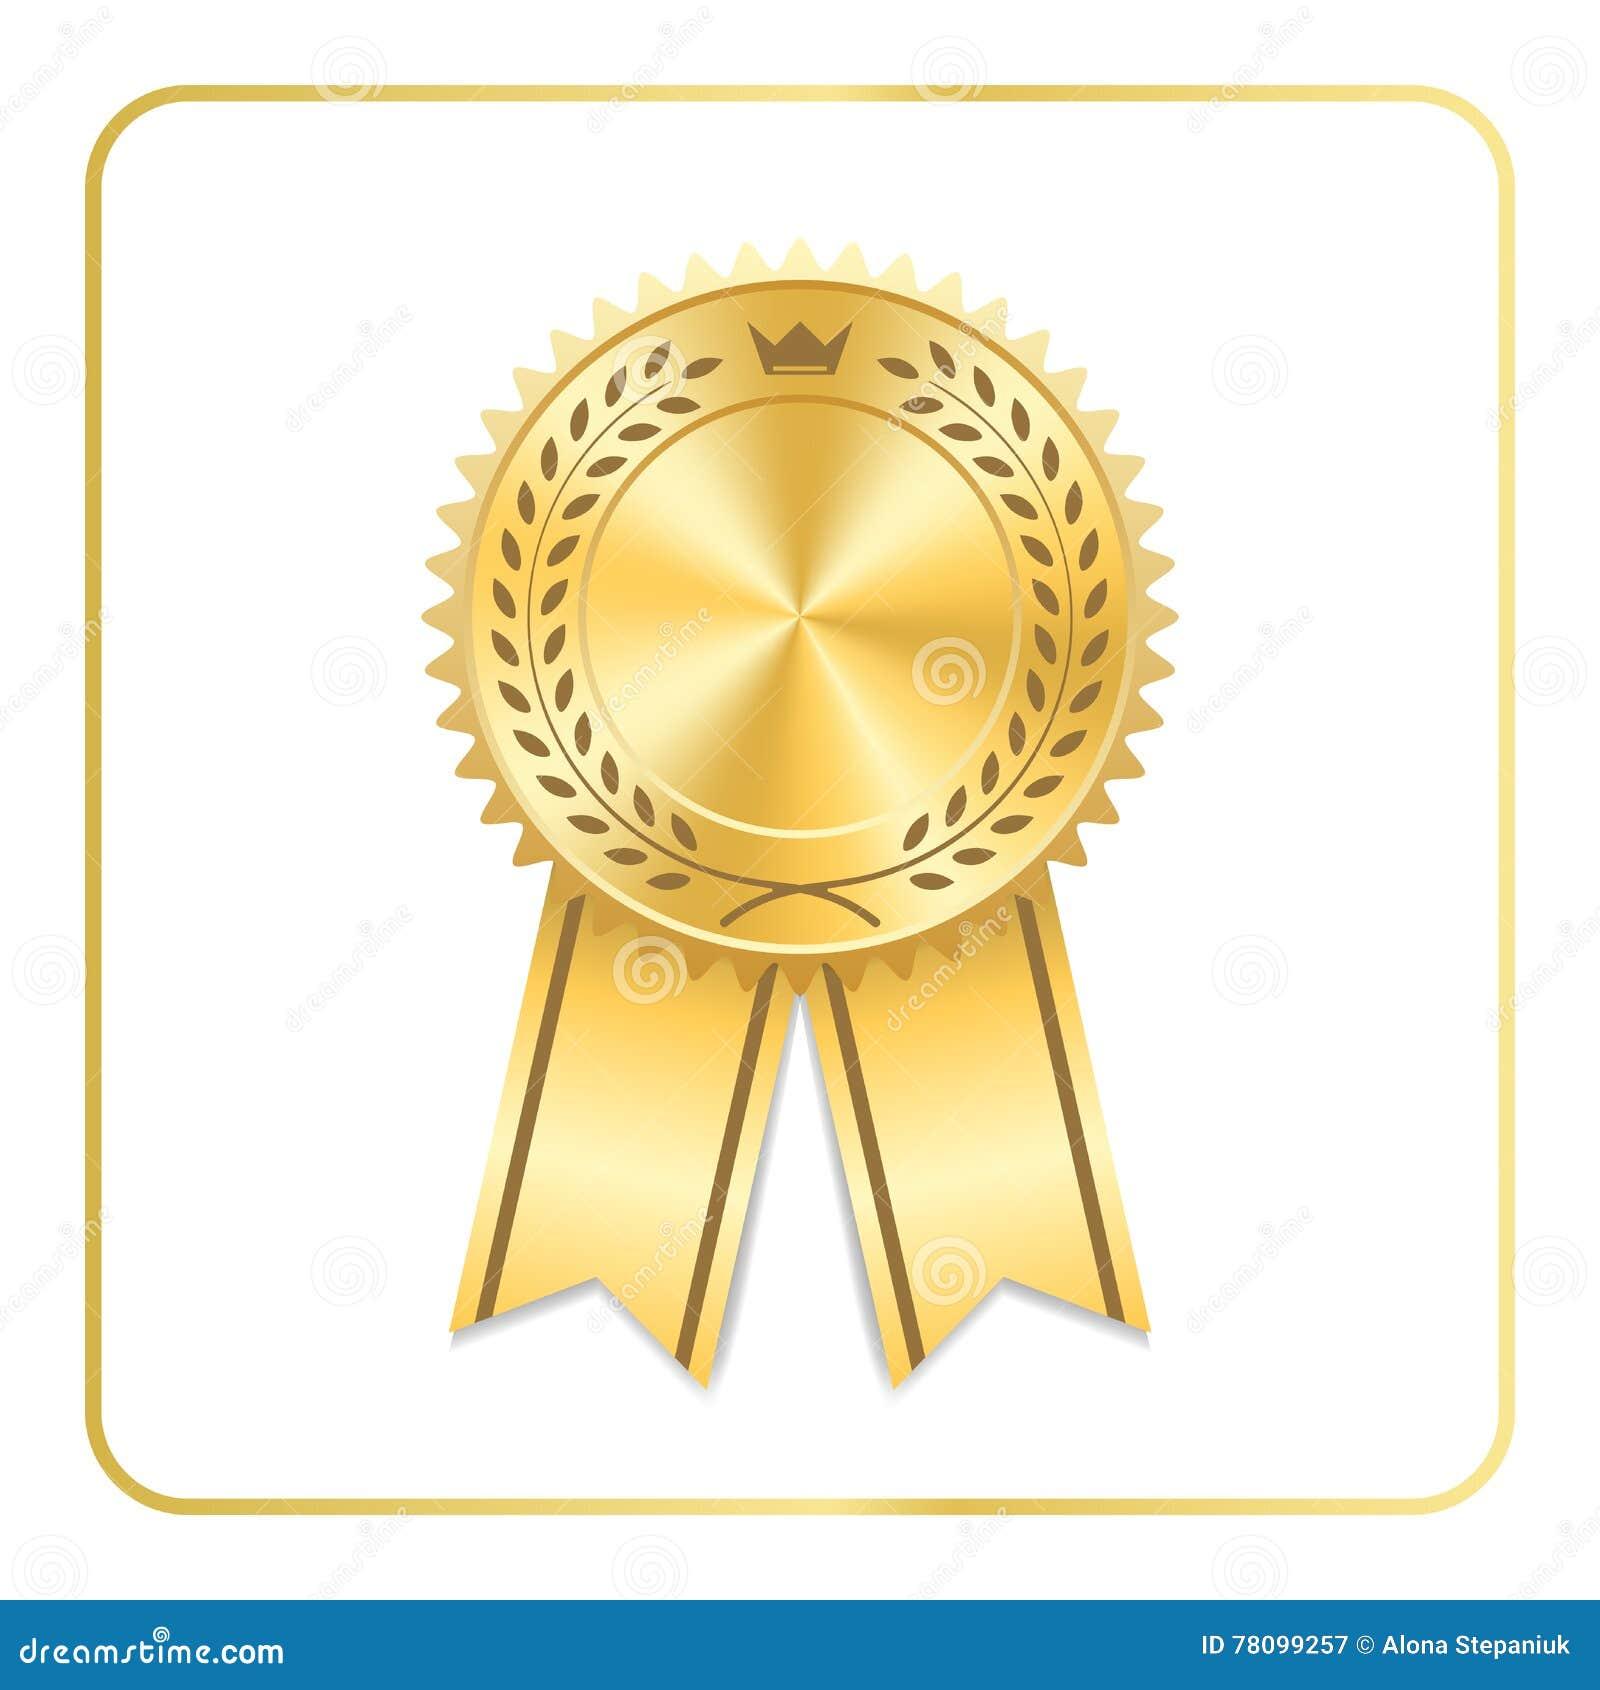 award ribbon gold icon laurel wreath crown stock vector